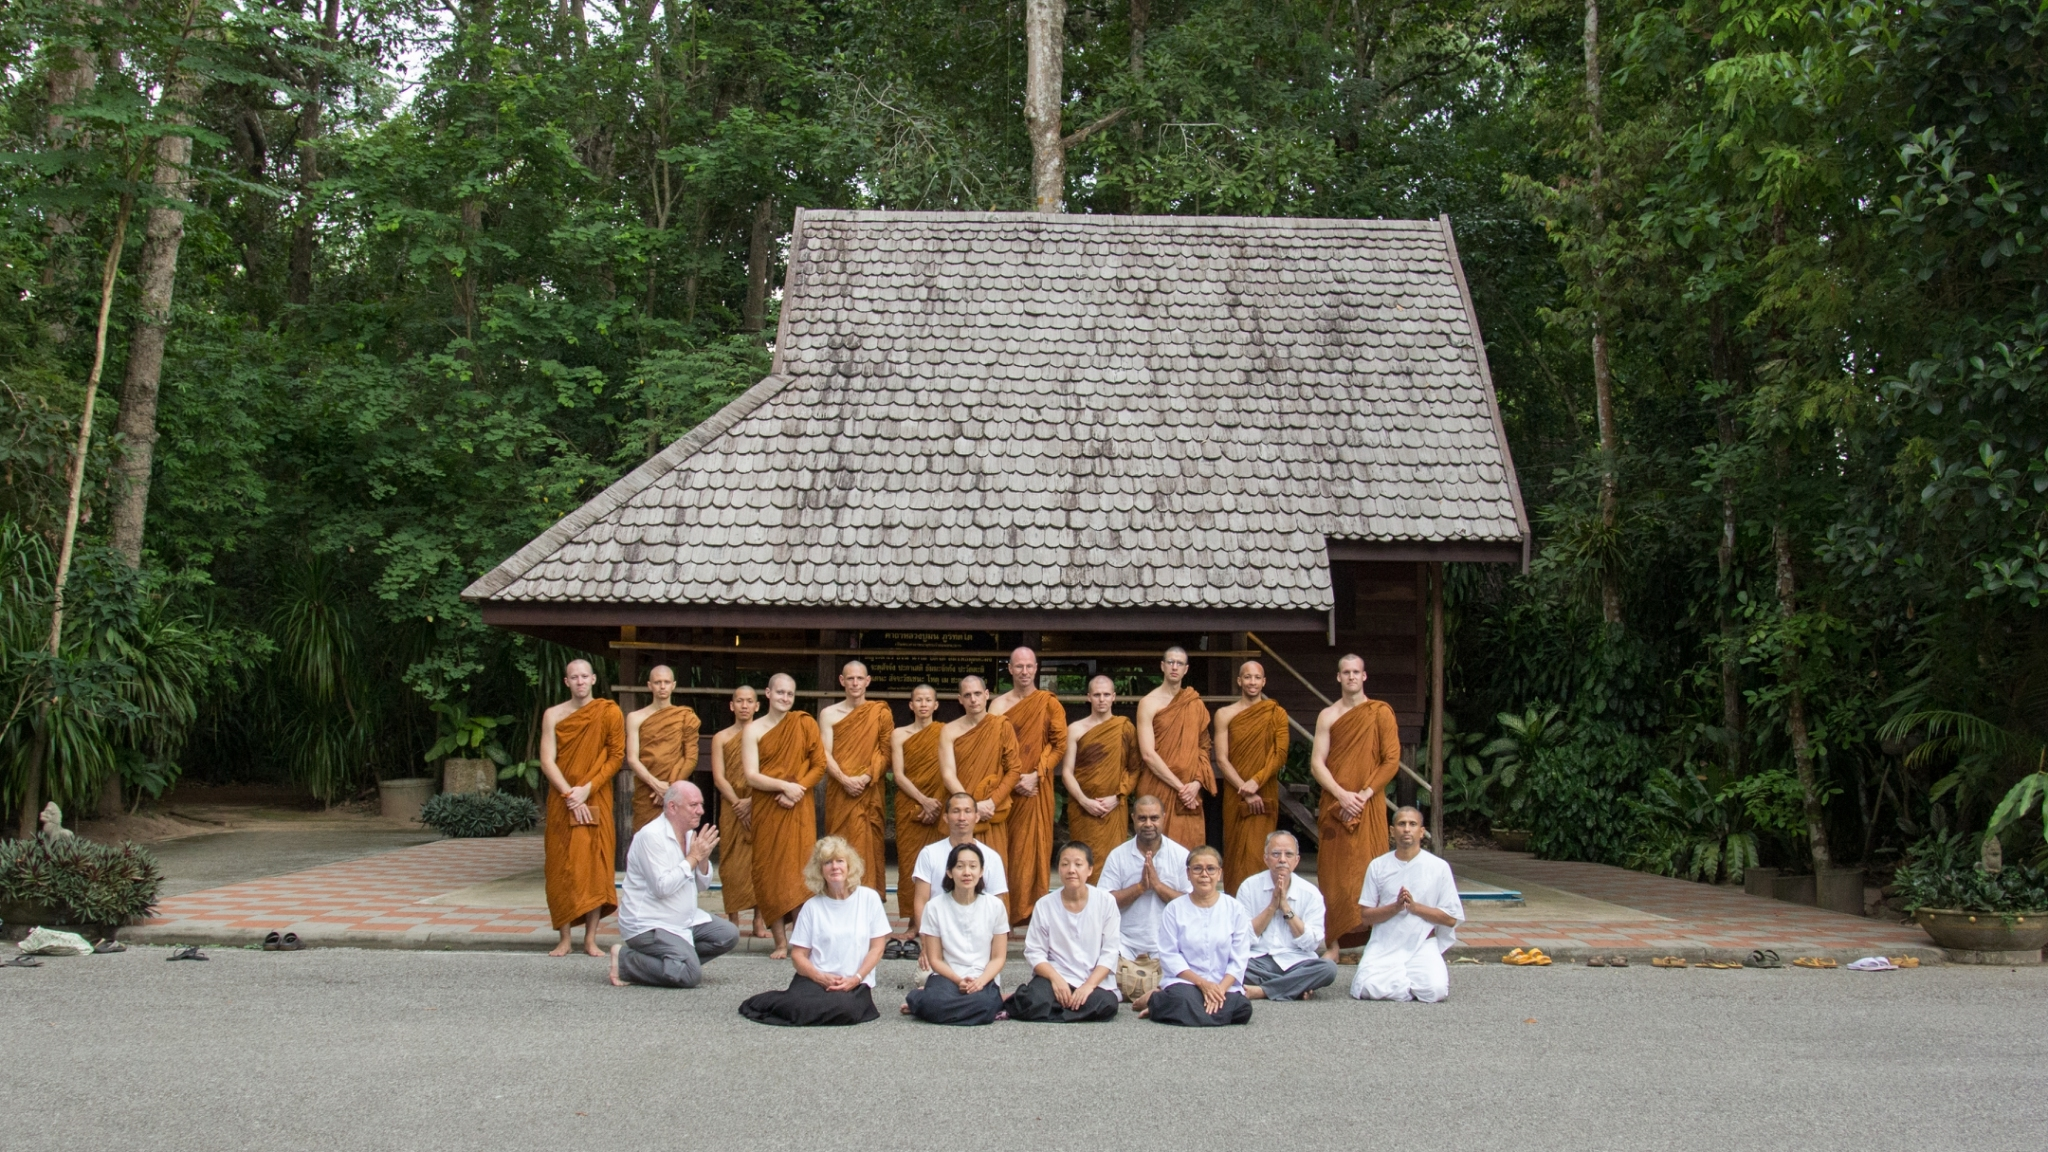 Lp Mun's Kuti in Wat Nak Nimit